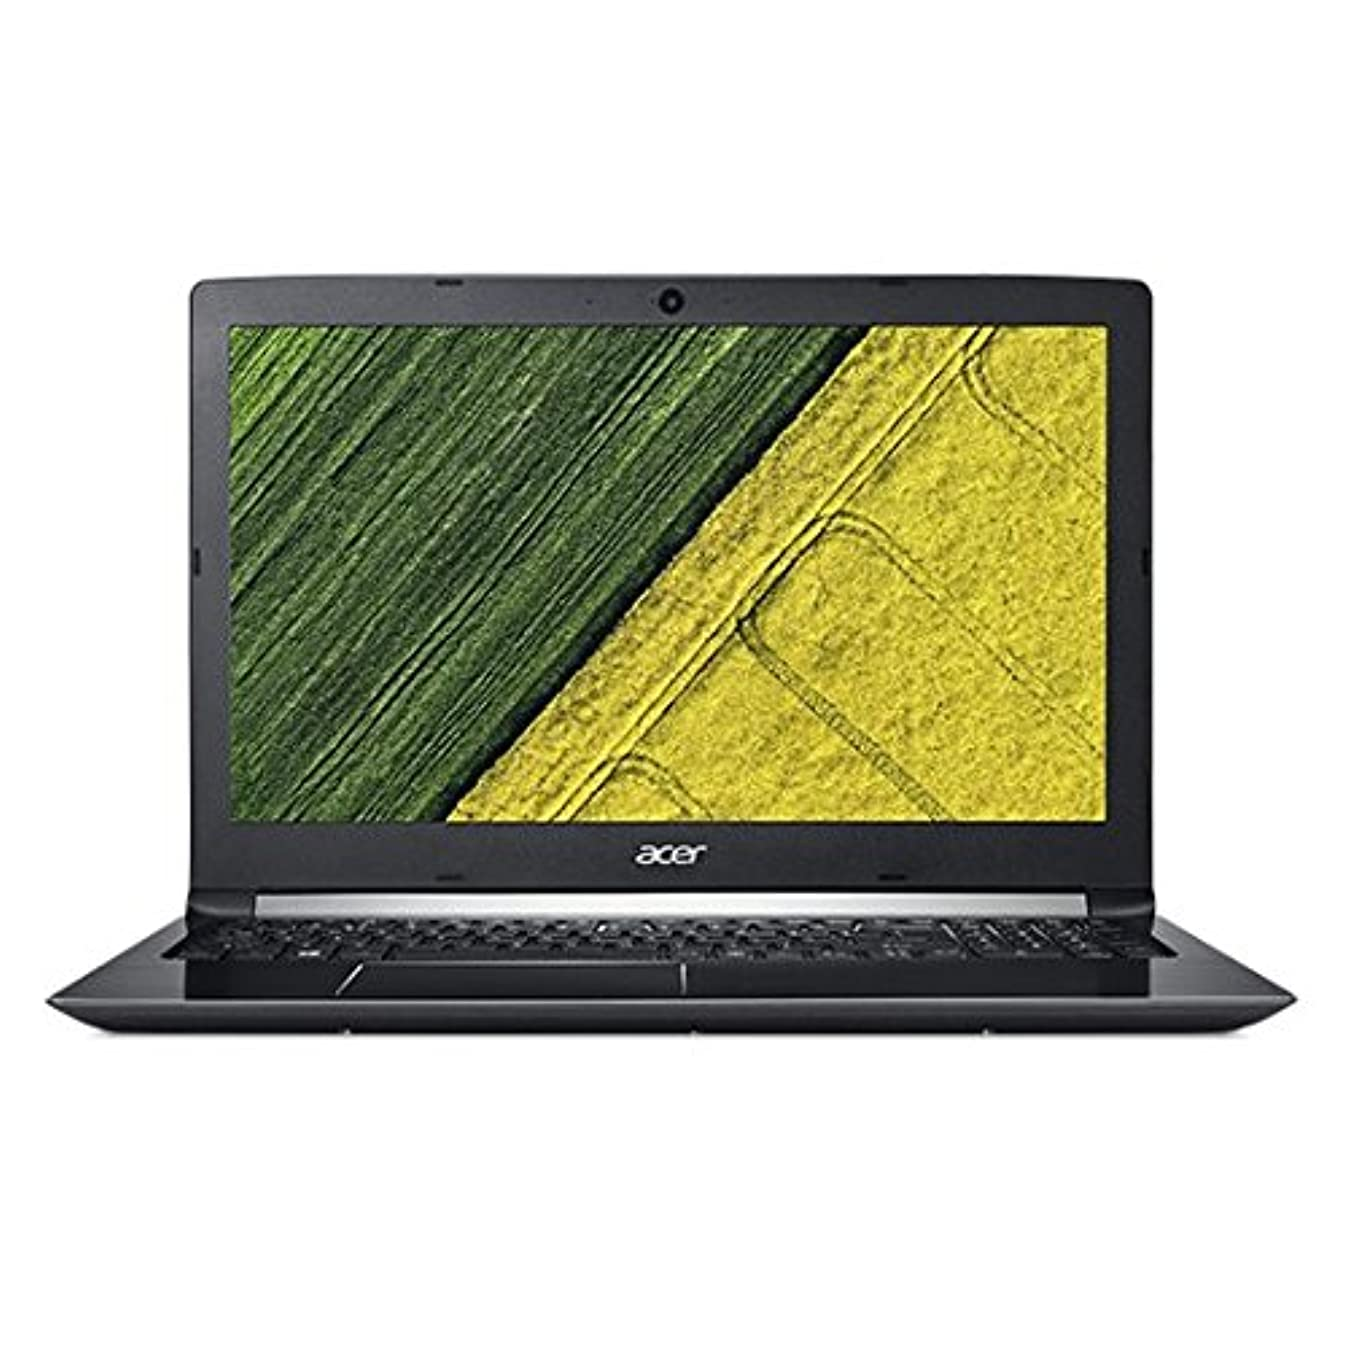 2018 Newest Acer Aspire 15.6 inch Full HD High Performance Business Laptop Computer (7th Gen Intel Core i7-7500U, 12GB DDR4, 512GB SSD, Windows 10 Home)